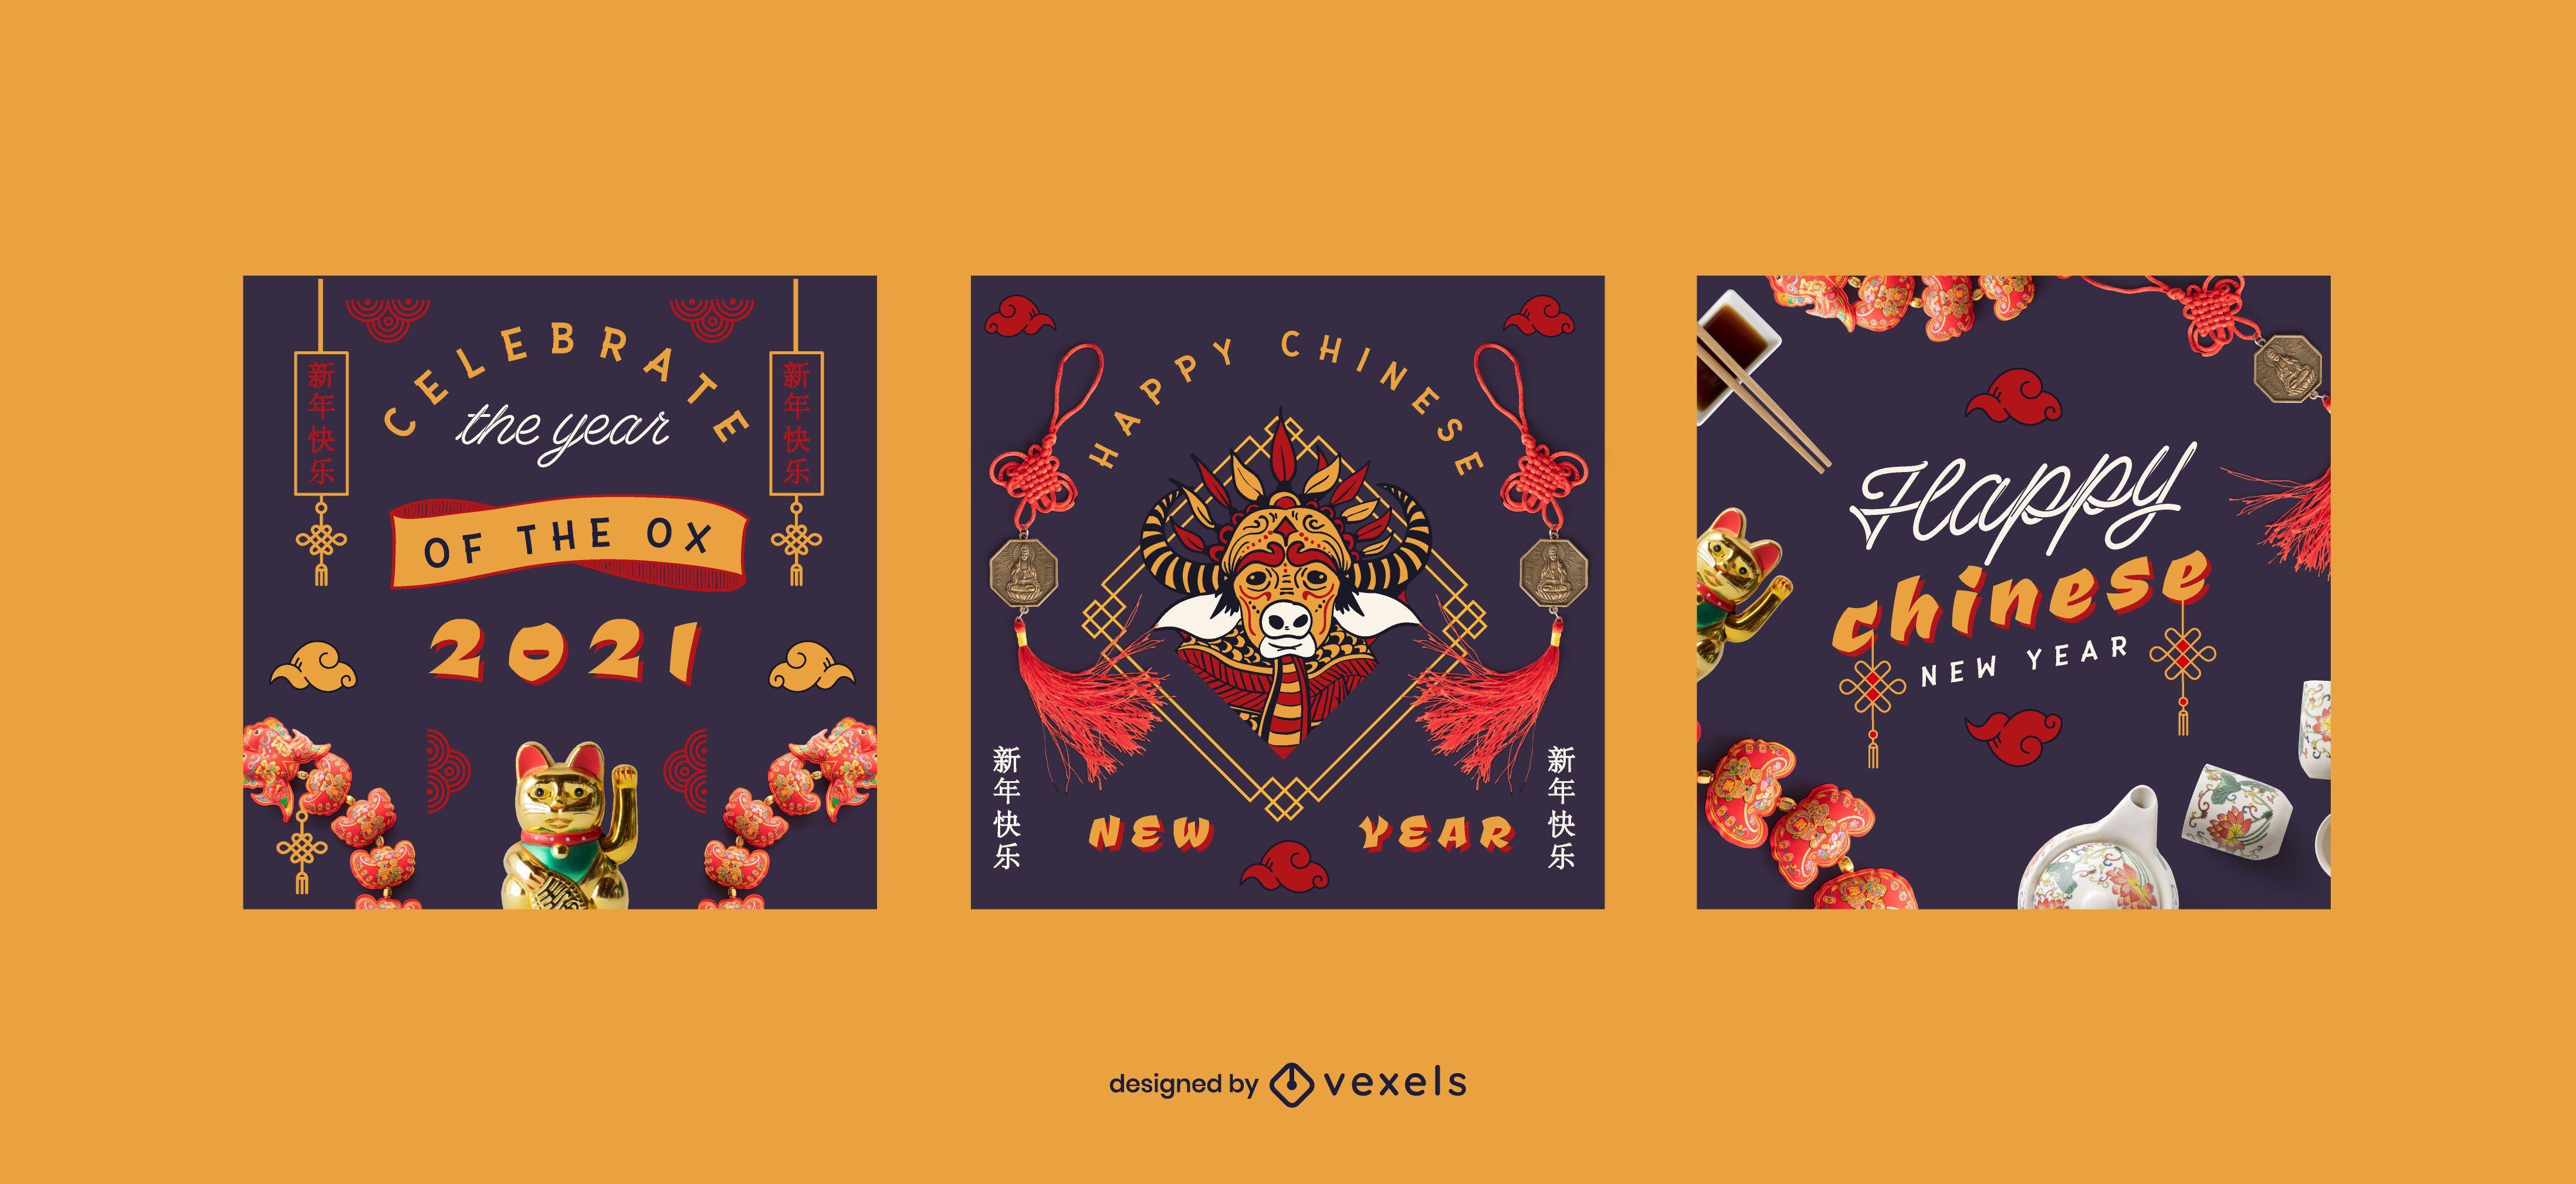 Chinesisches Neujahrs-Social-Media-Post-Set